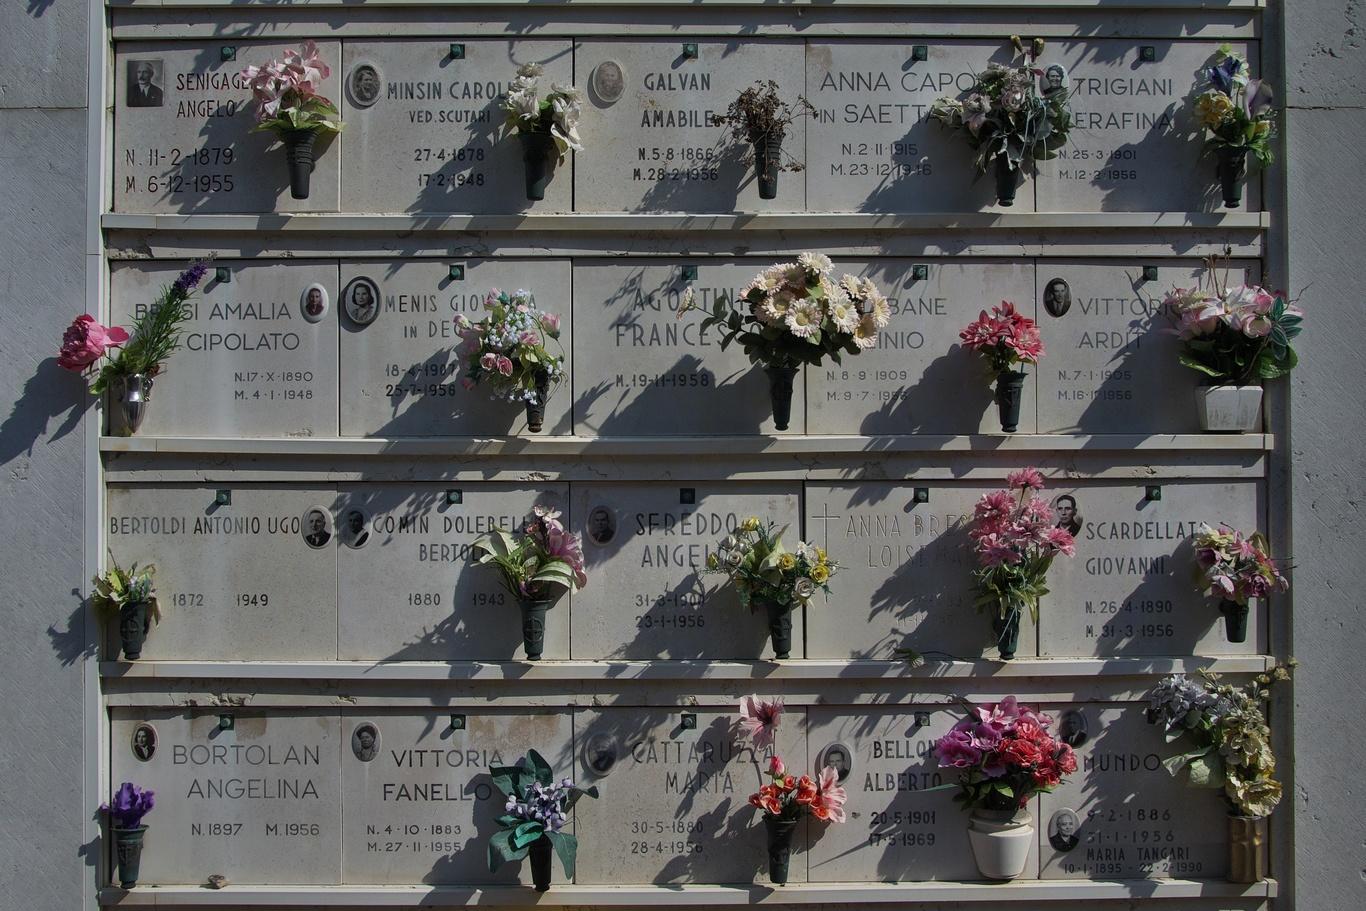 Hřbitov San Michele